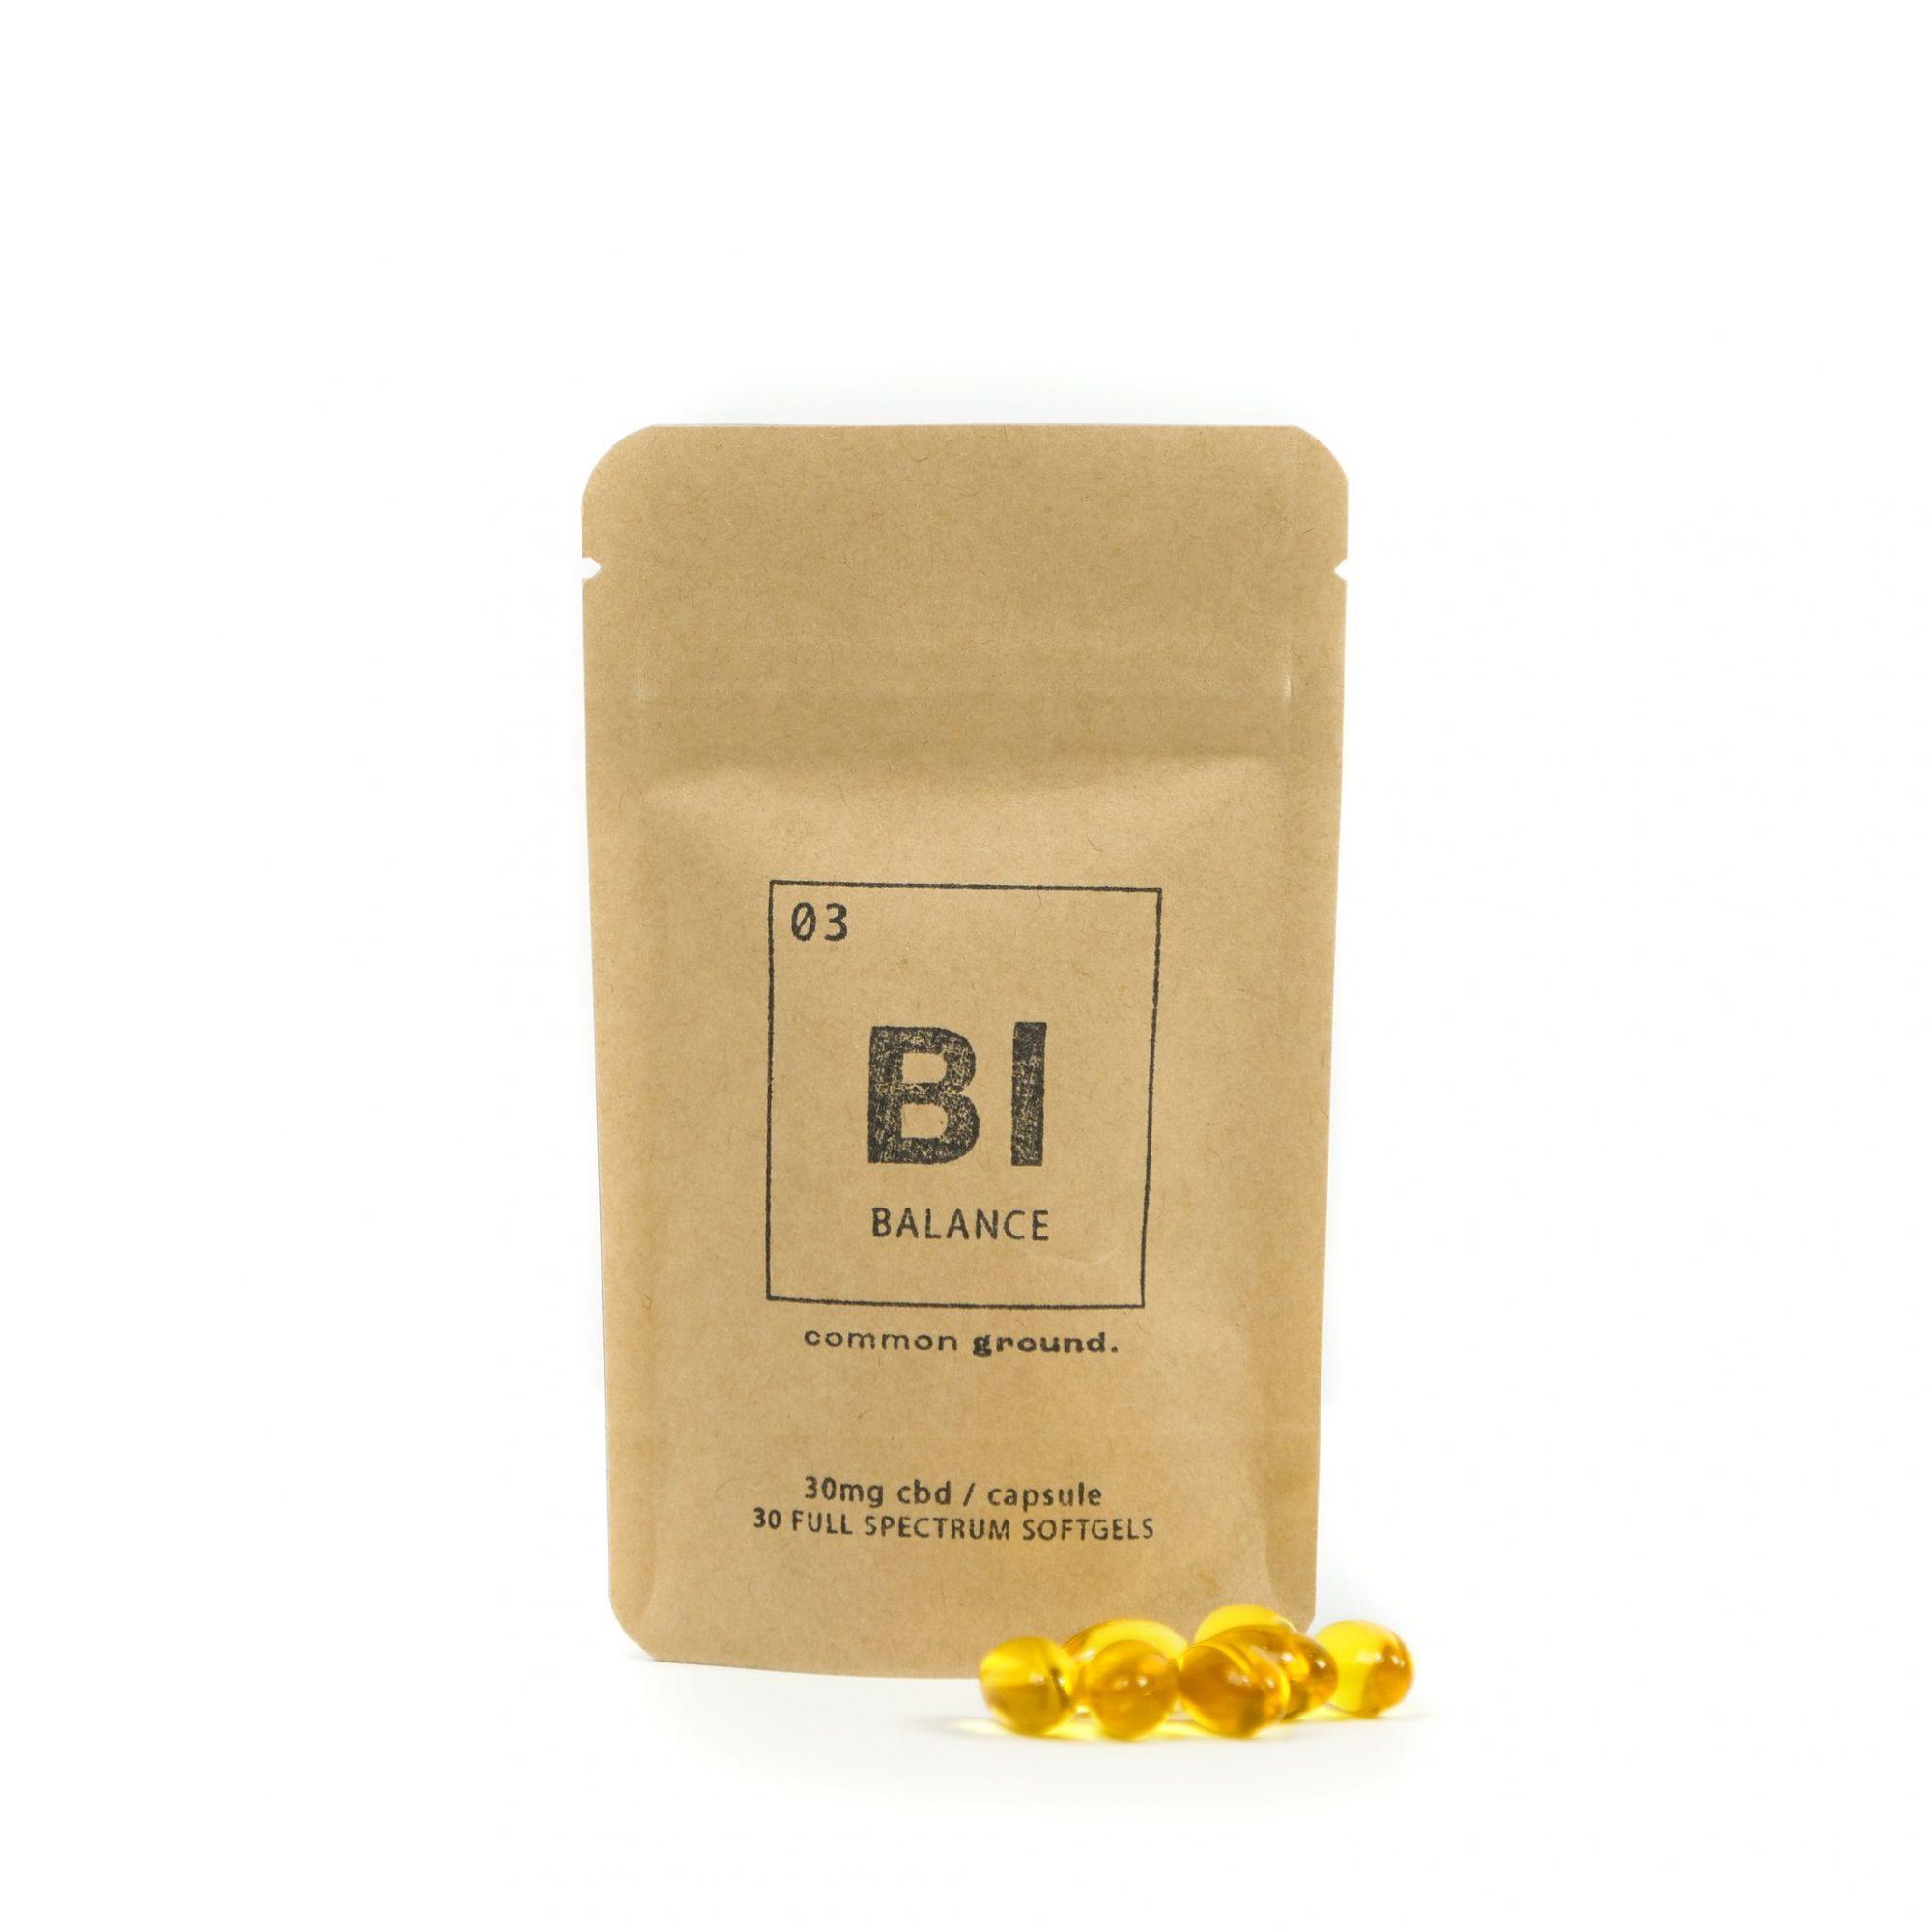 P1133440 2048x2048 - BALANCE / 30 mg per Capsule